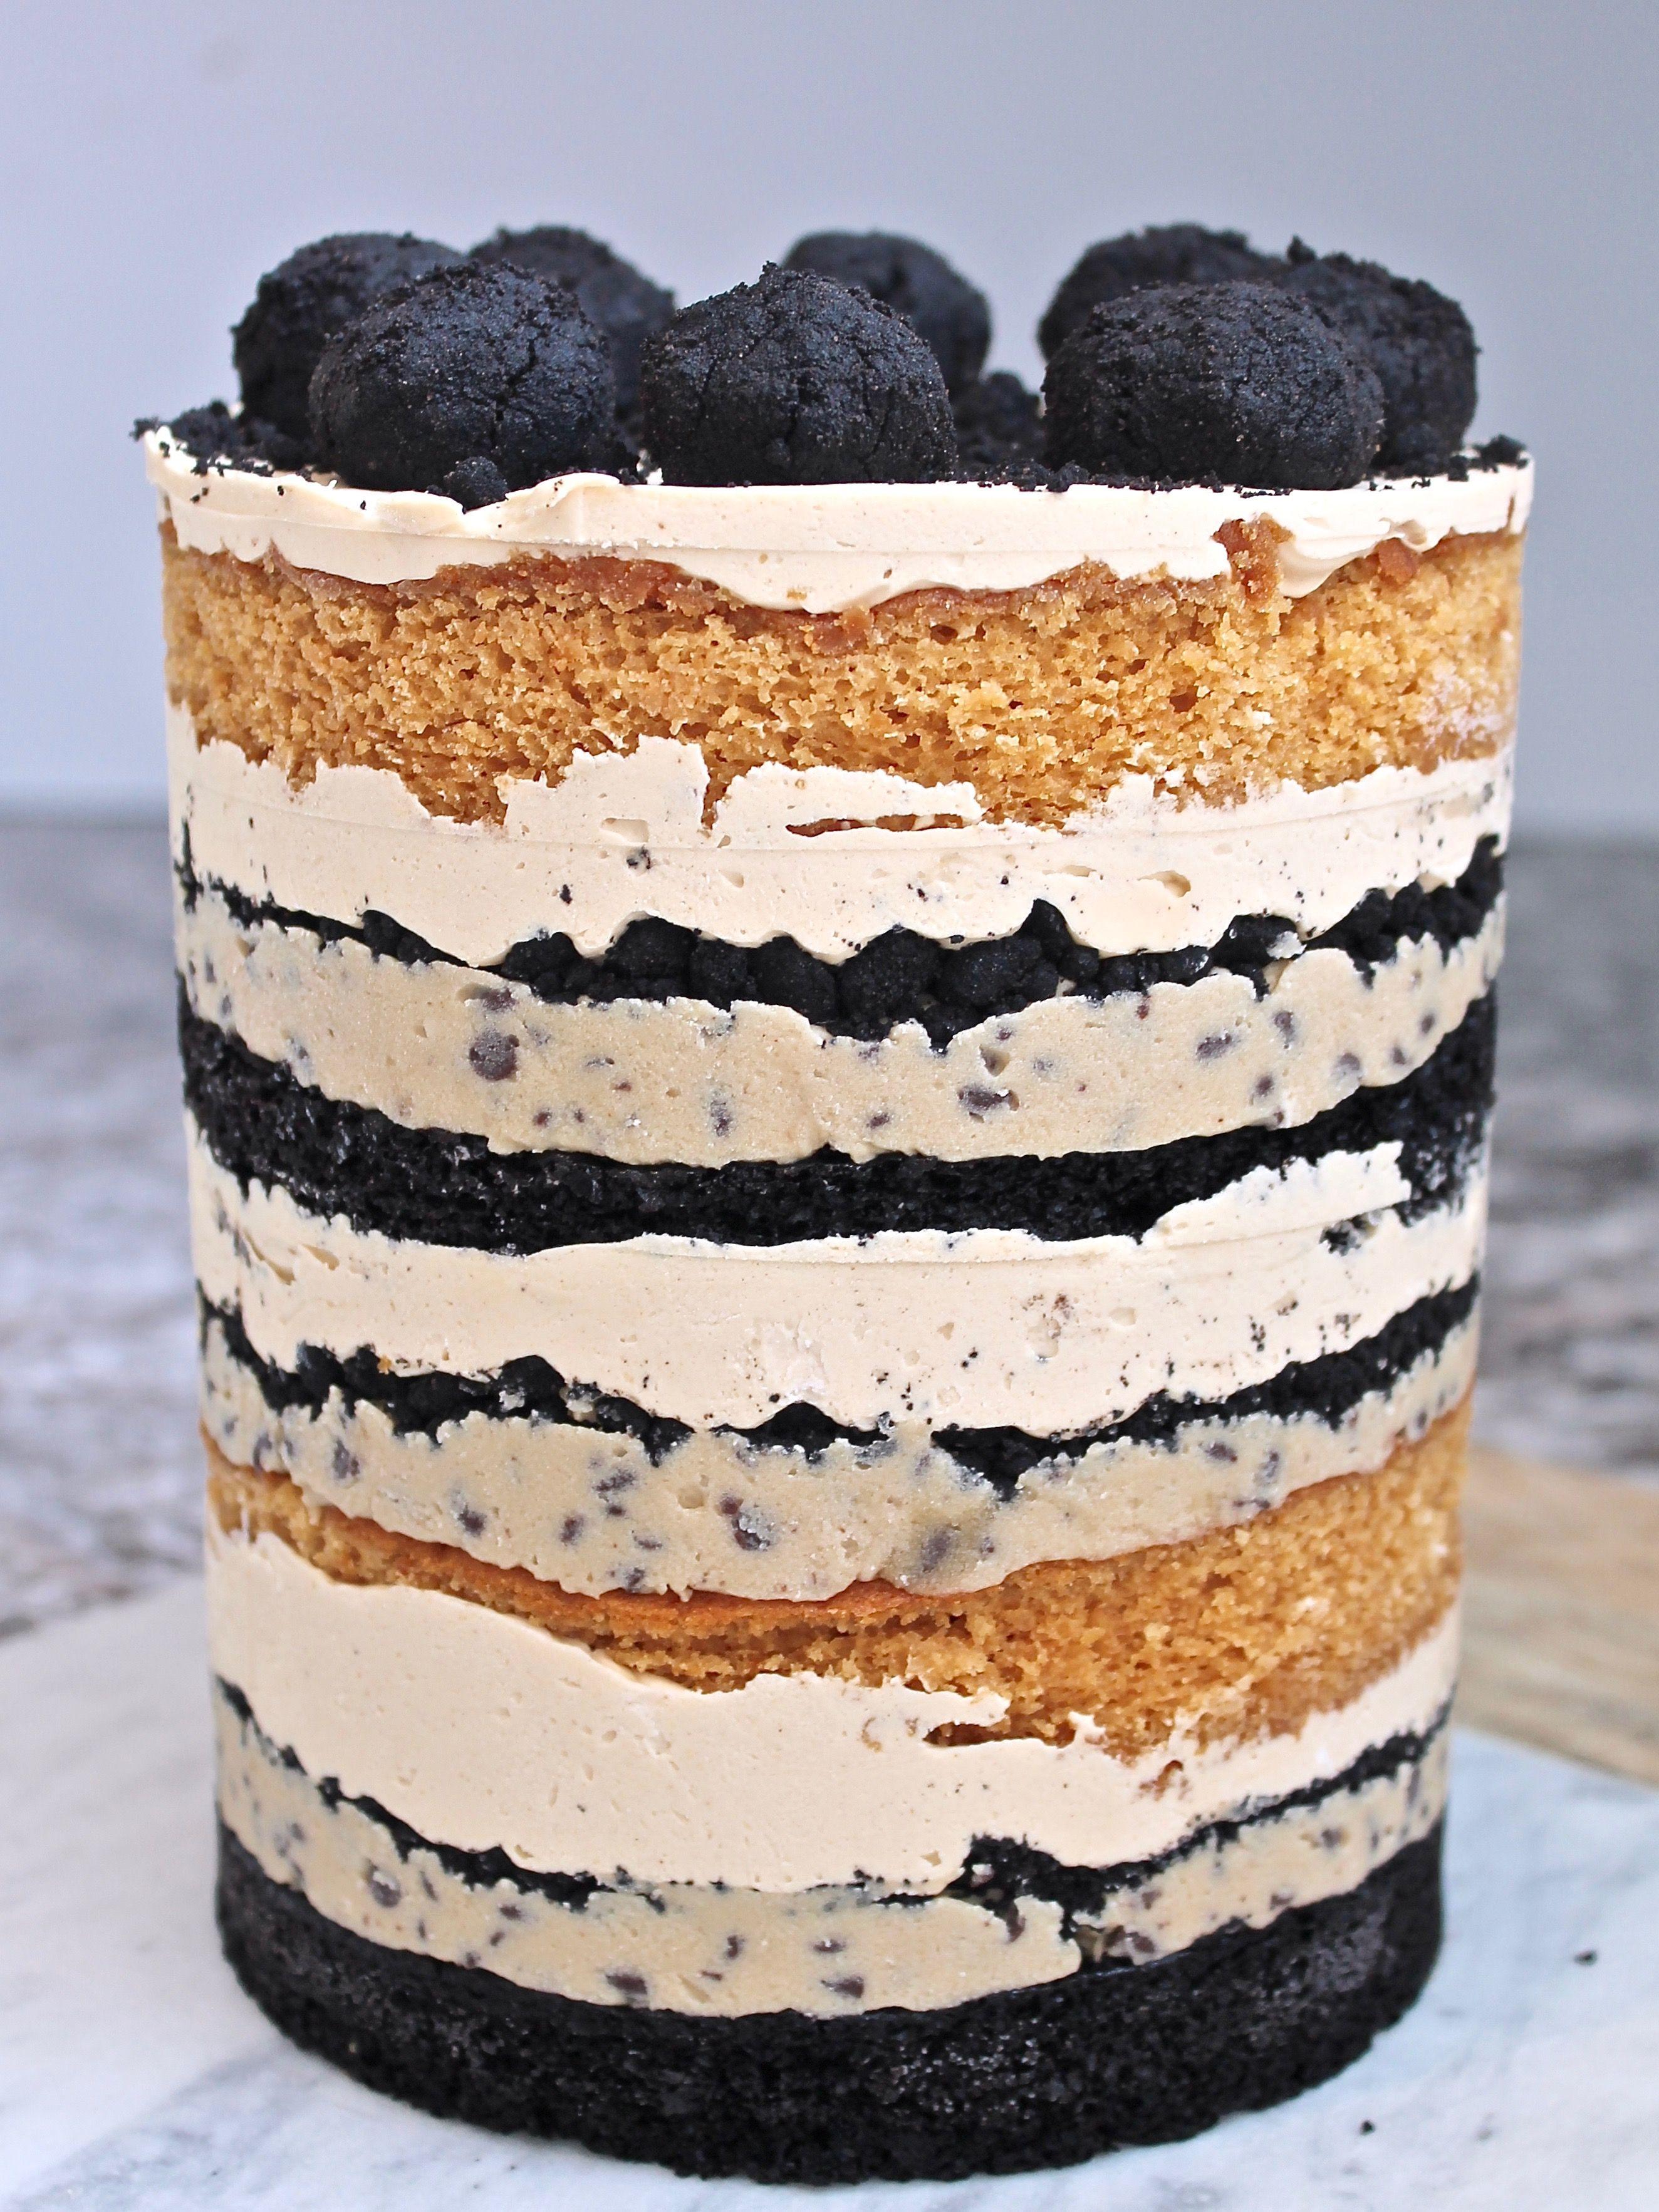 Ben and jerrys inspired tonight show cake no bake cake